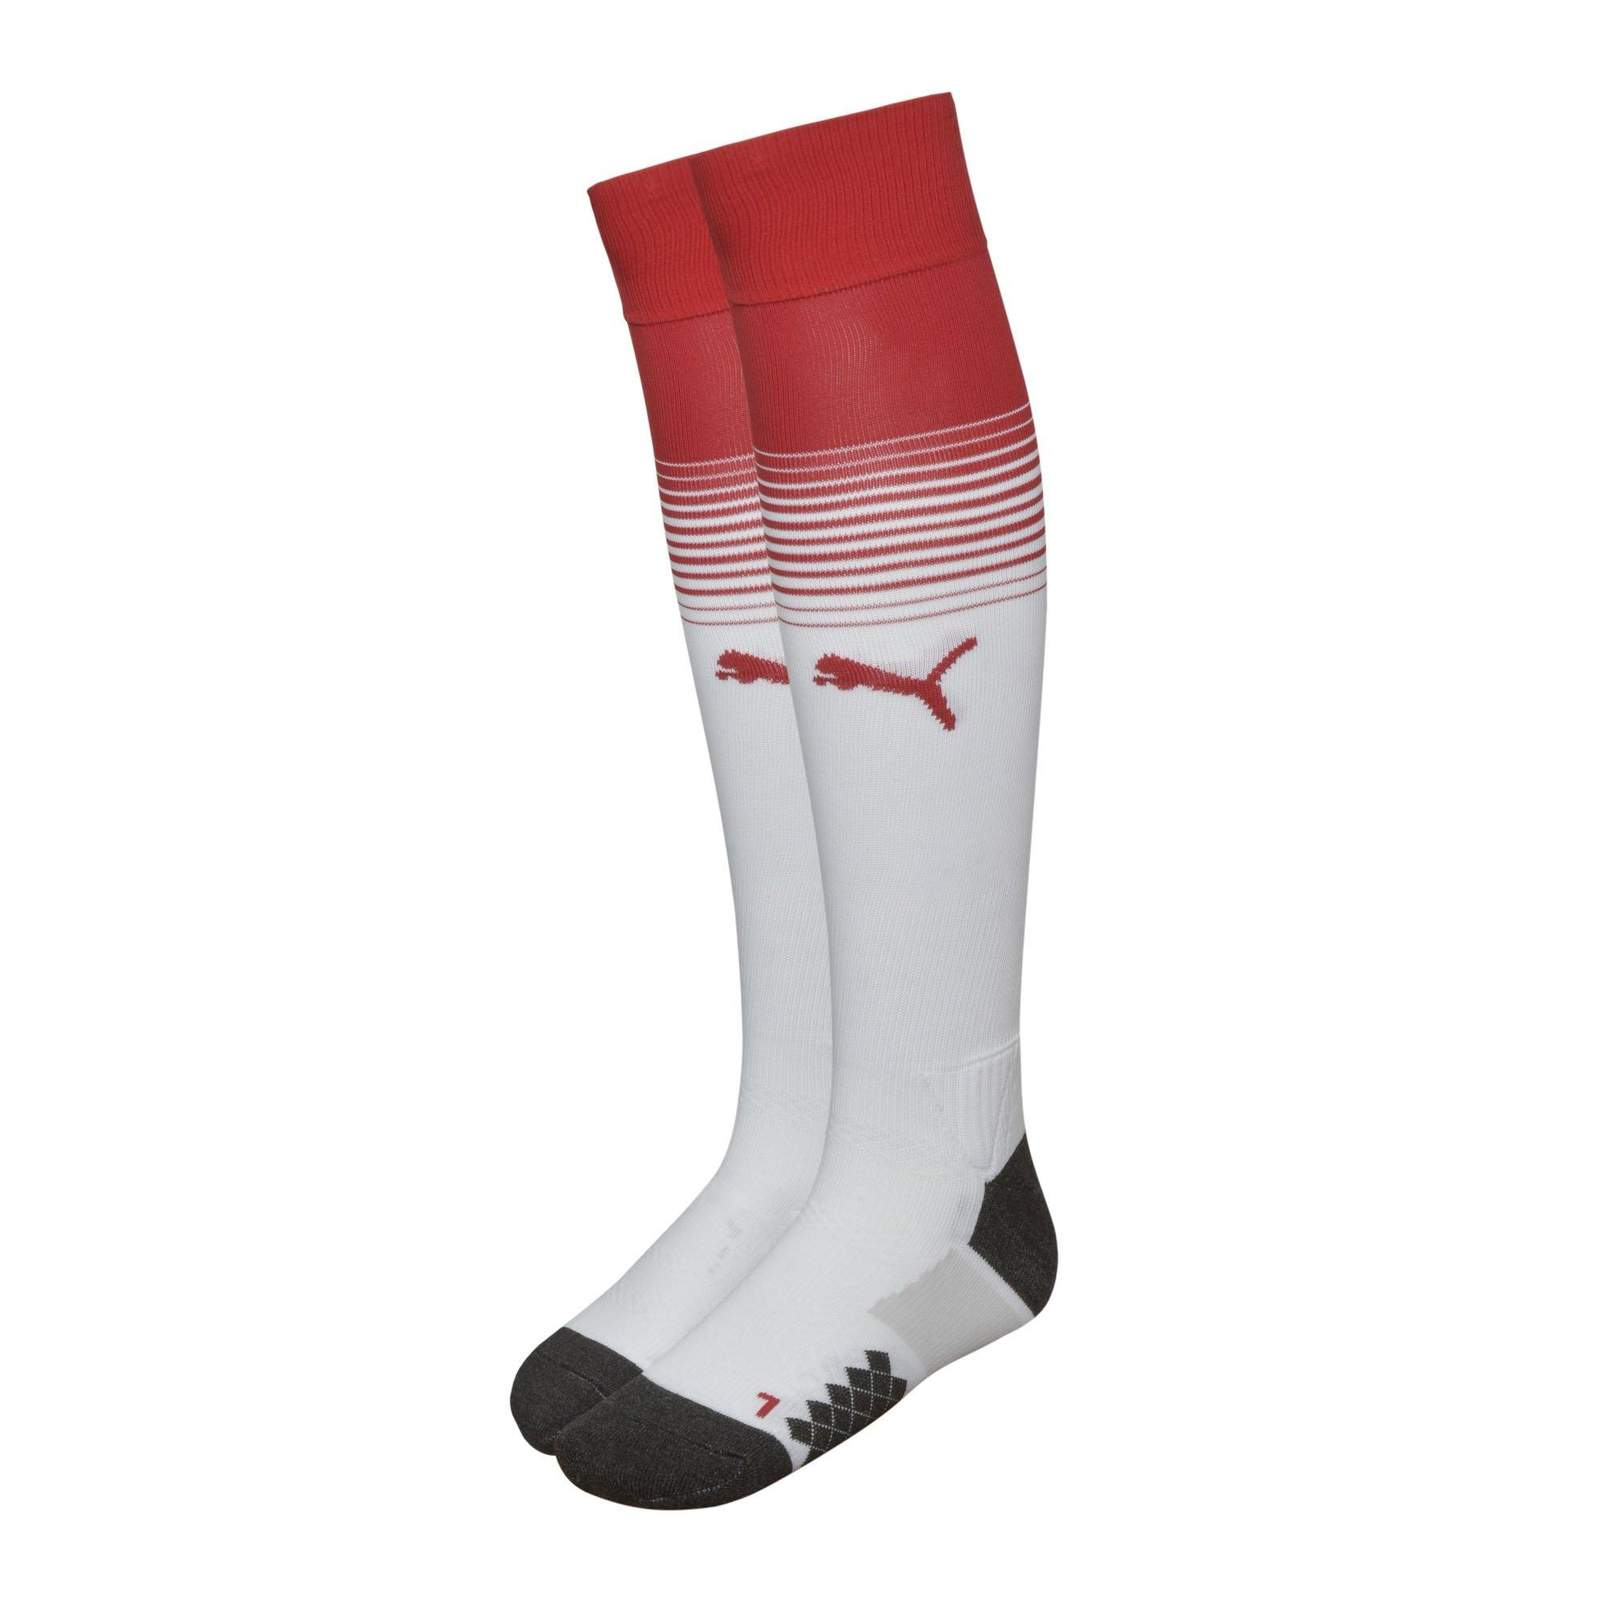 arsenal-17-18-home-socks